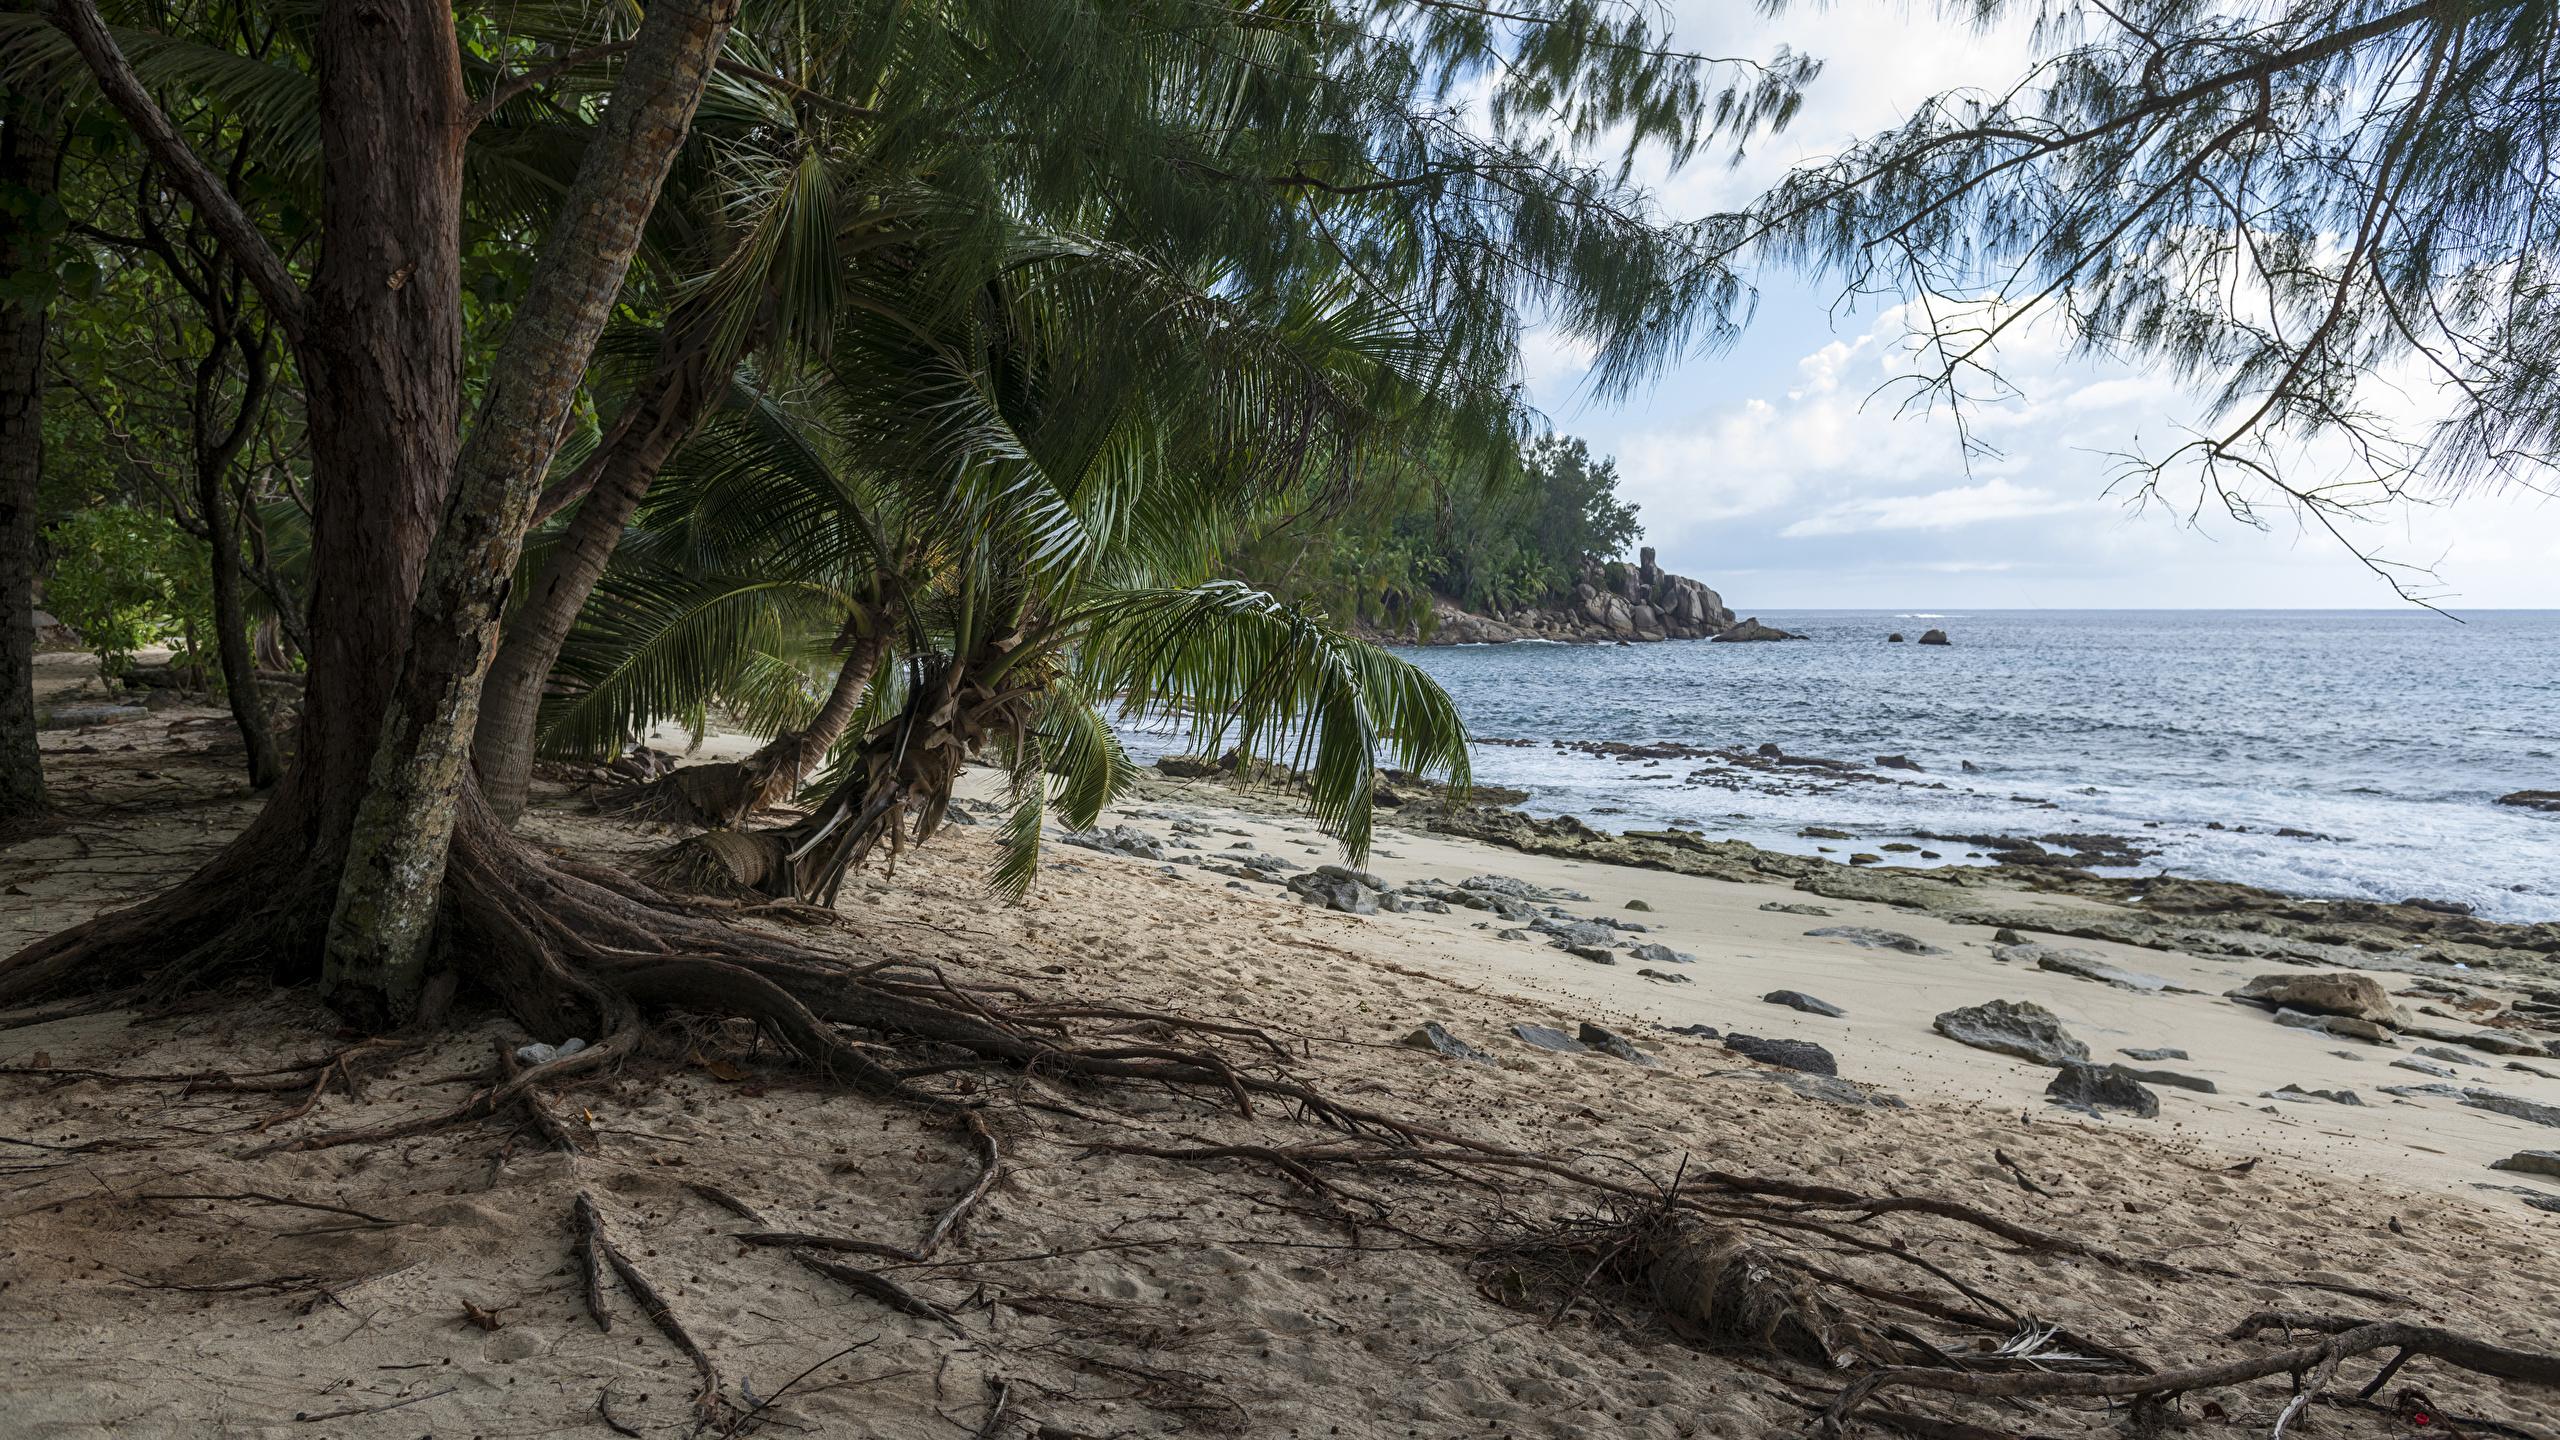 Картинка Police Beach Seychelles Пляж Природа Пальмы Тропики берег 2560x1440 Побережье